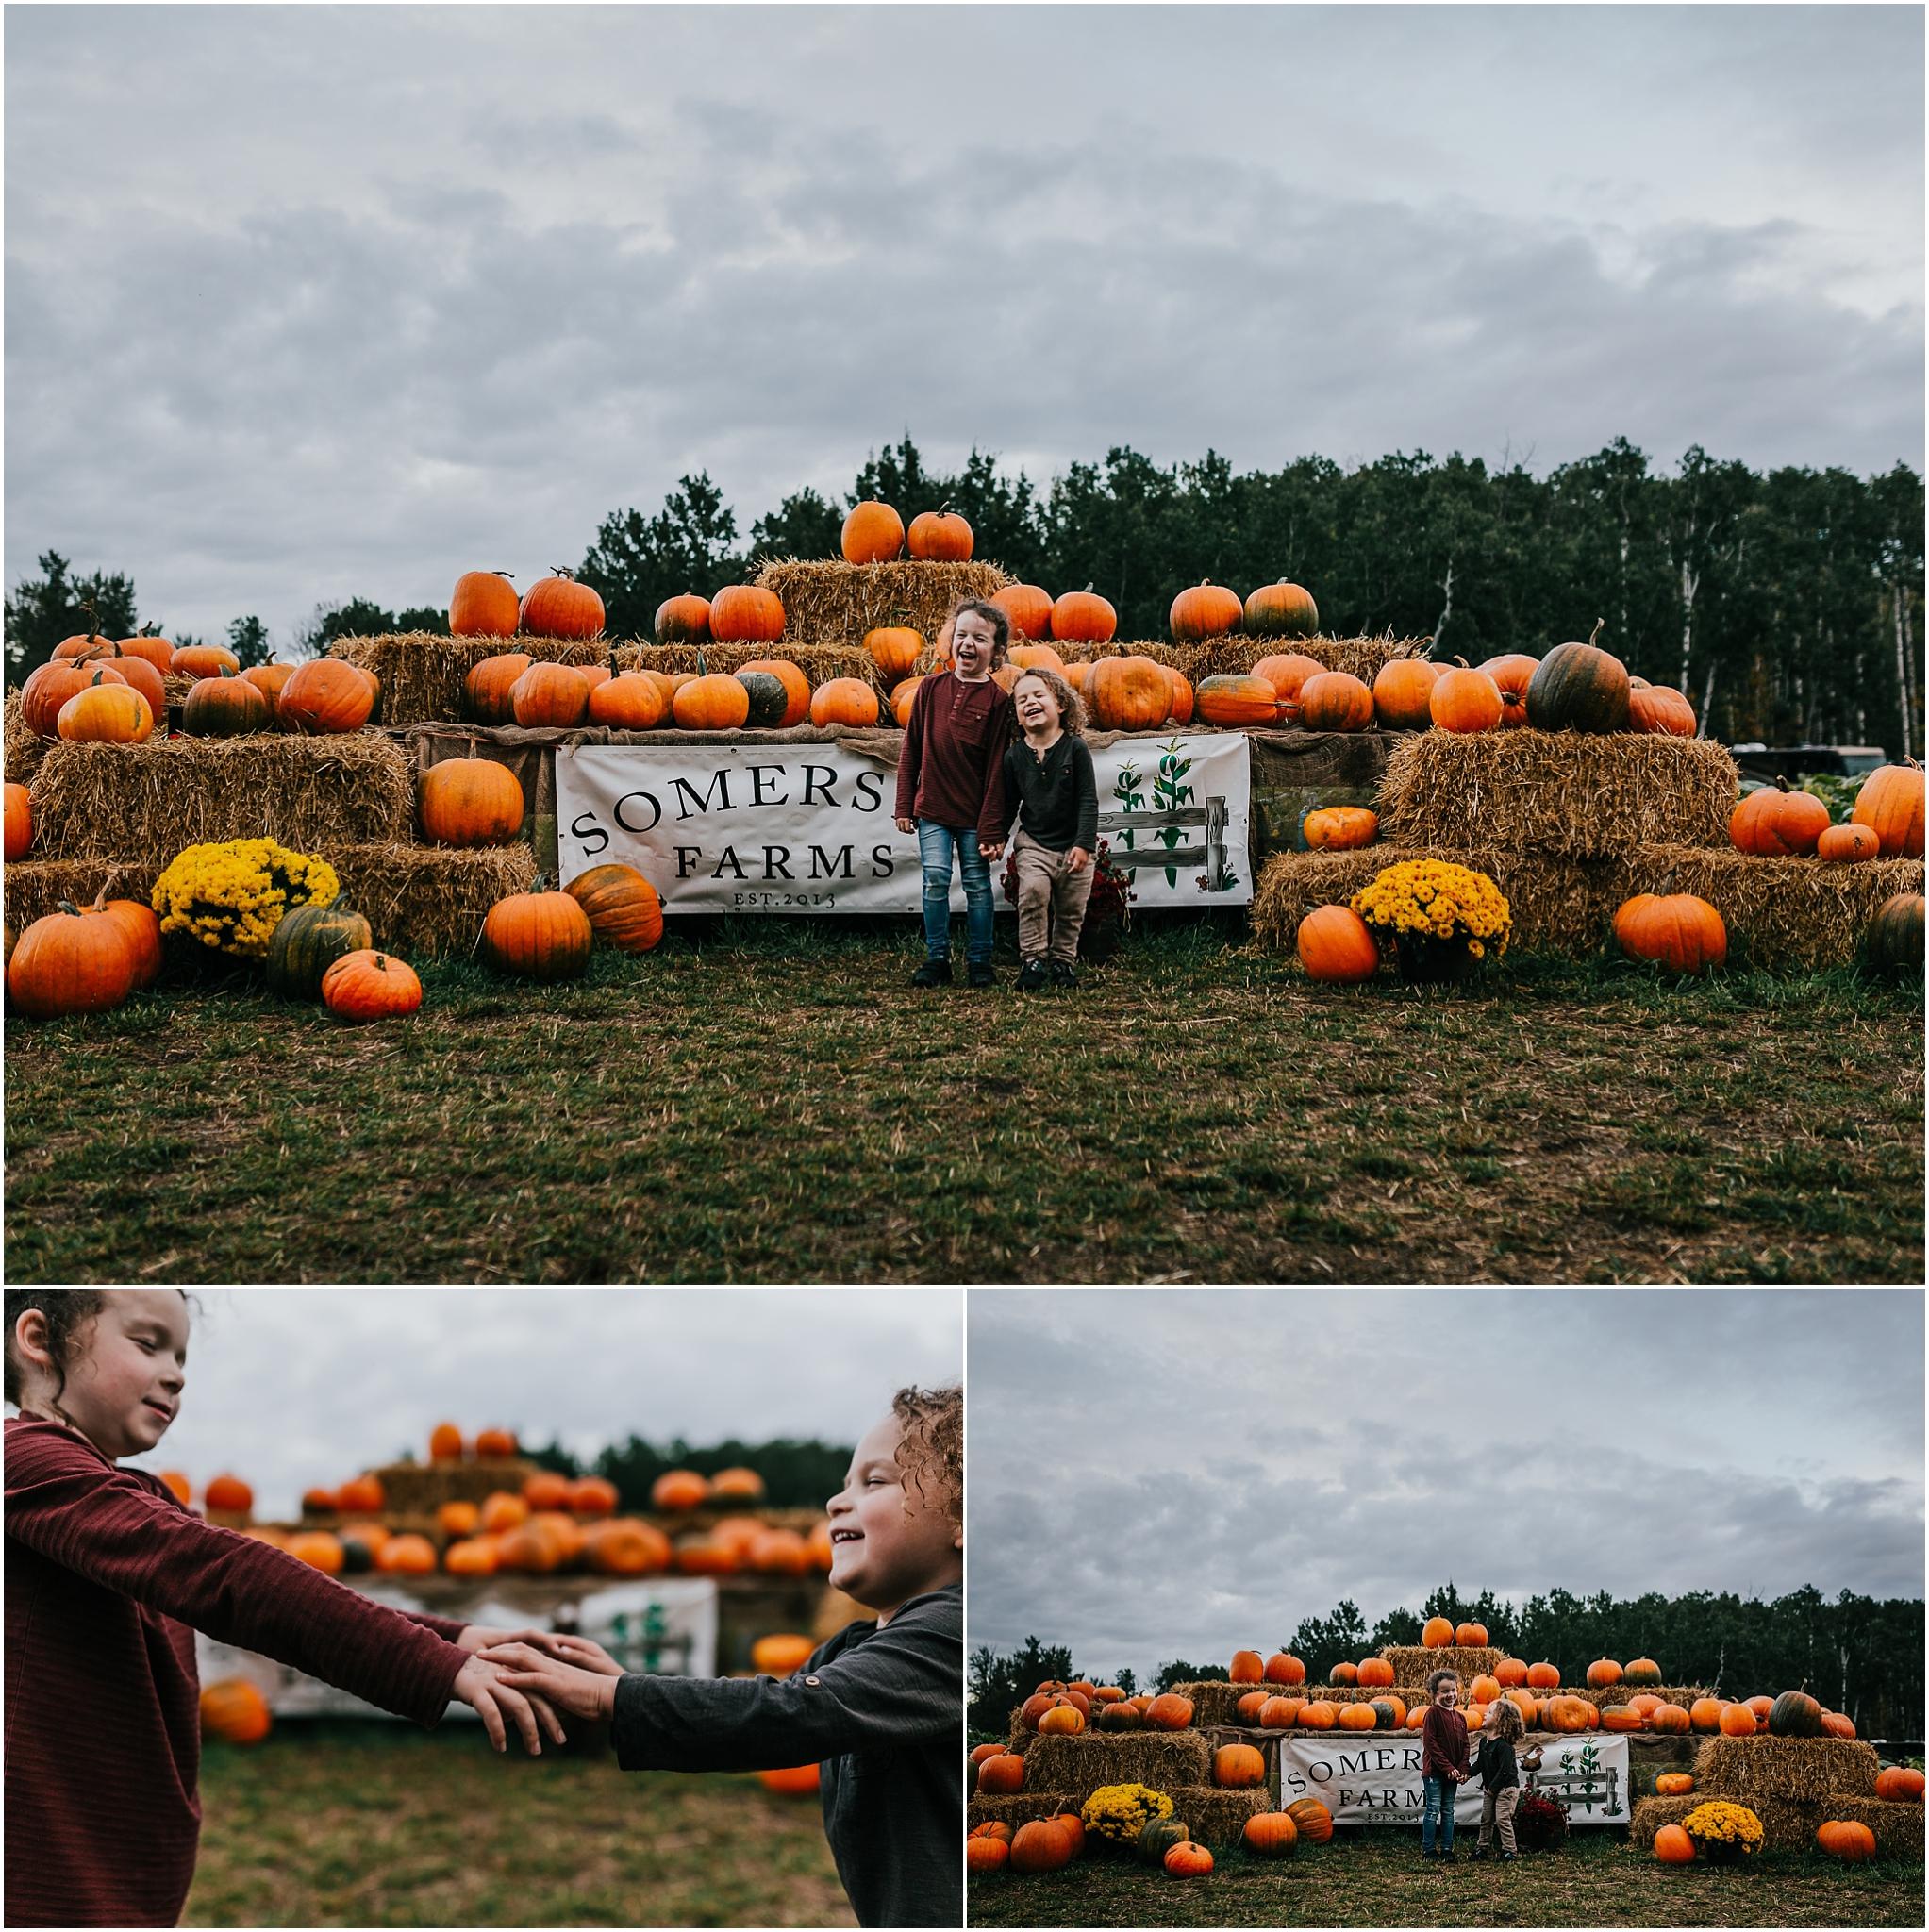 Treelines Photography - Edmonton Family Photographer - Edmonton Photographer - Pumpkin Patch U-Pick - Somerset Farms